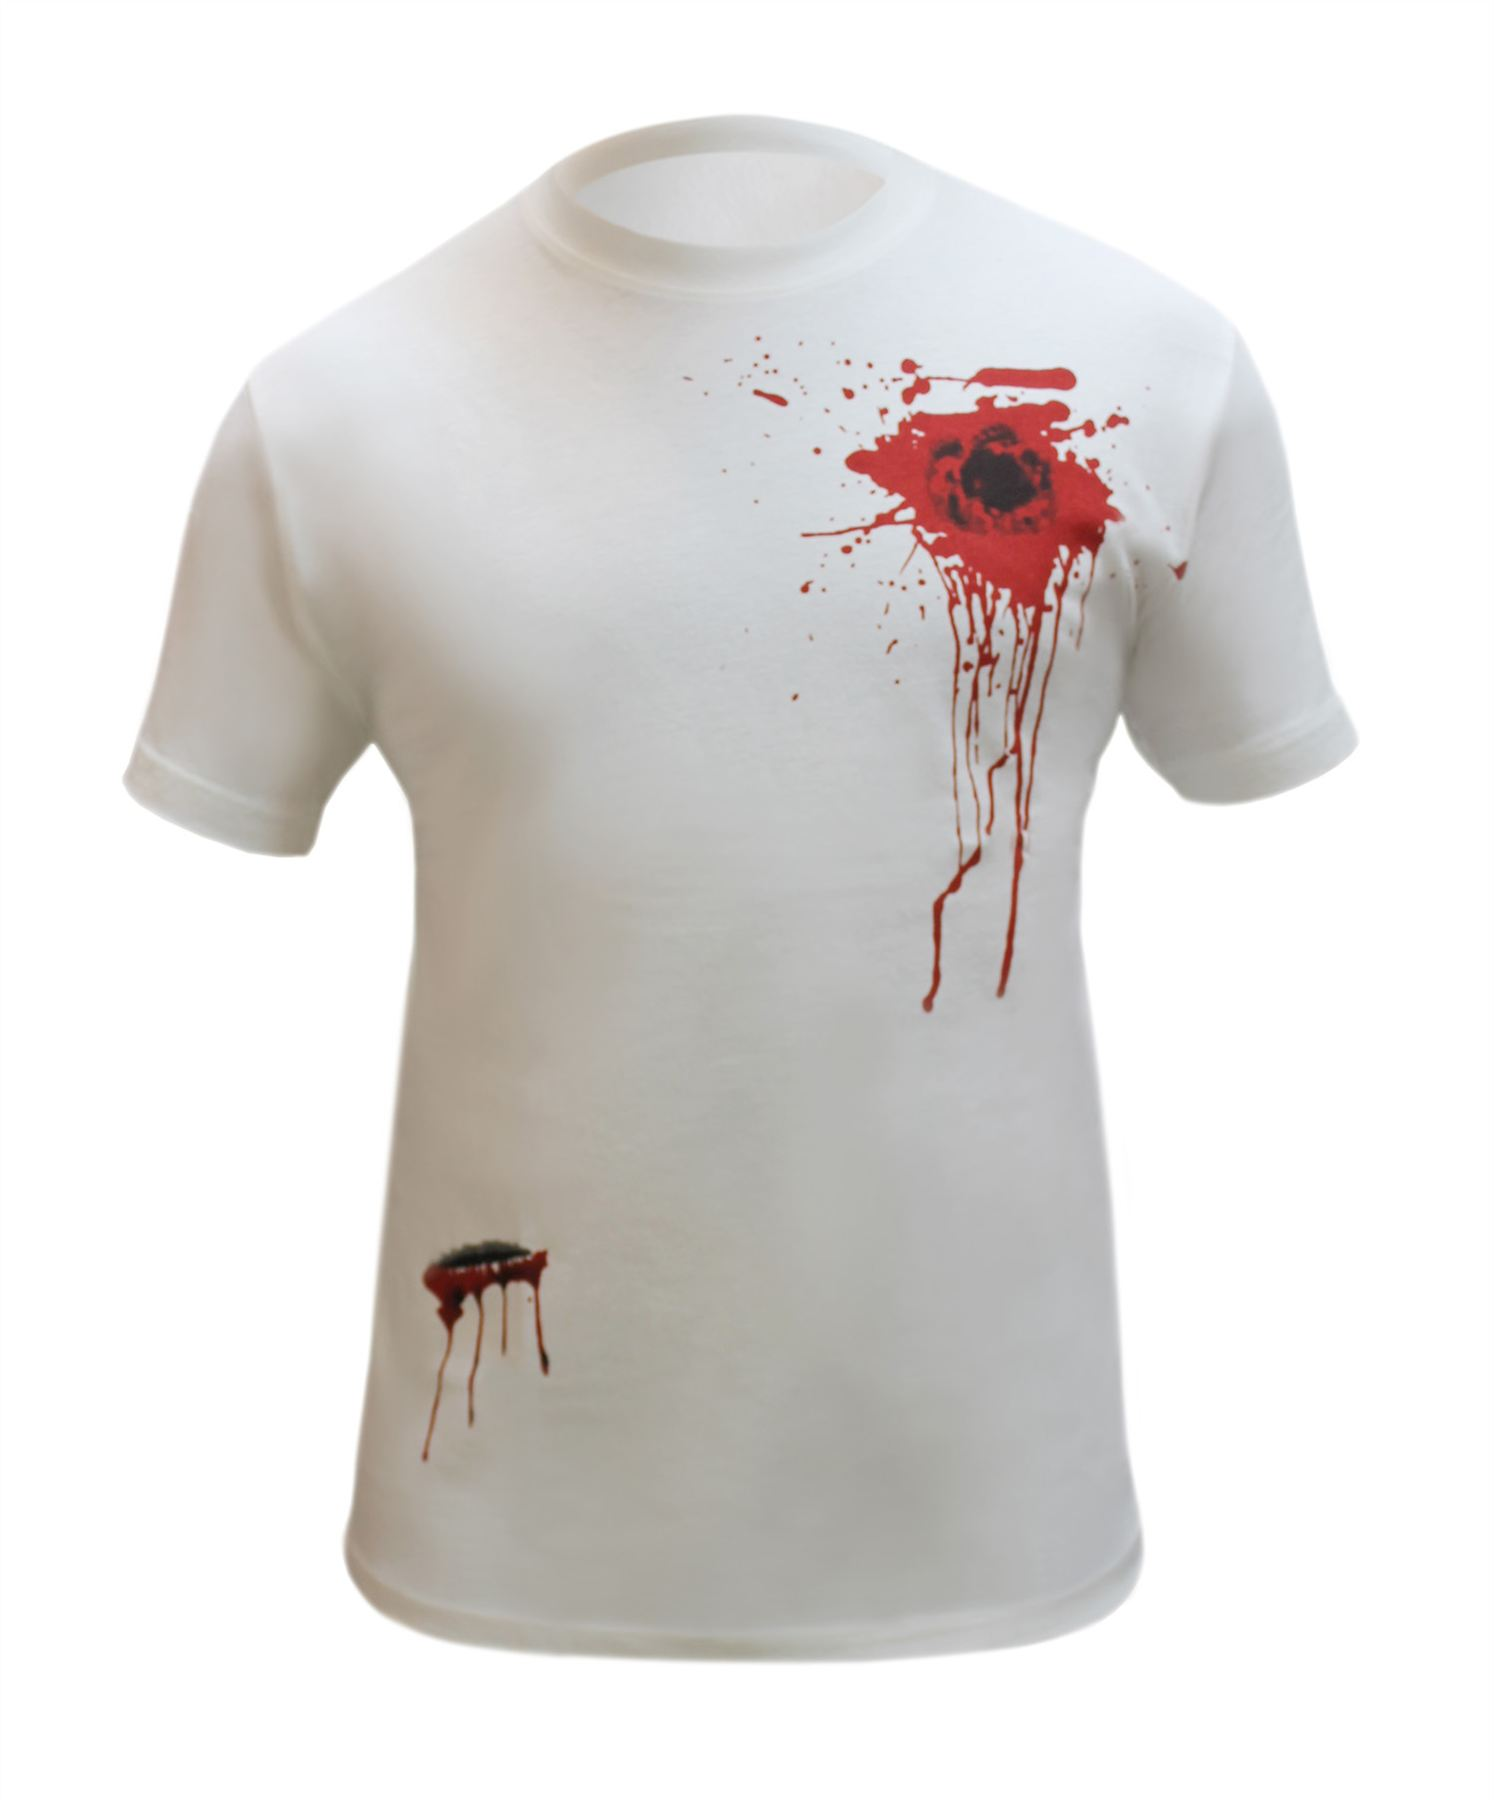 halloween scary horror blood tops t-shirt wound bleeding bullet